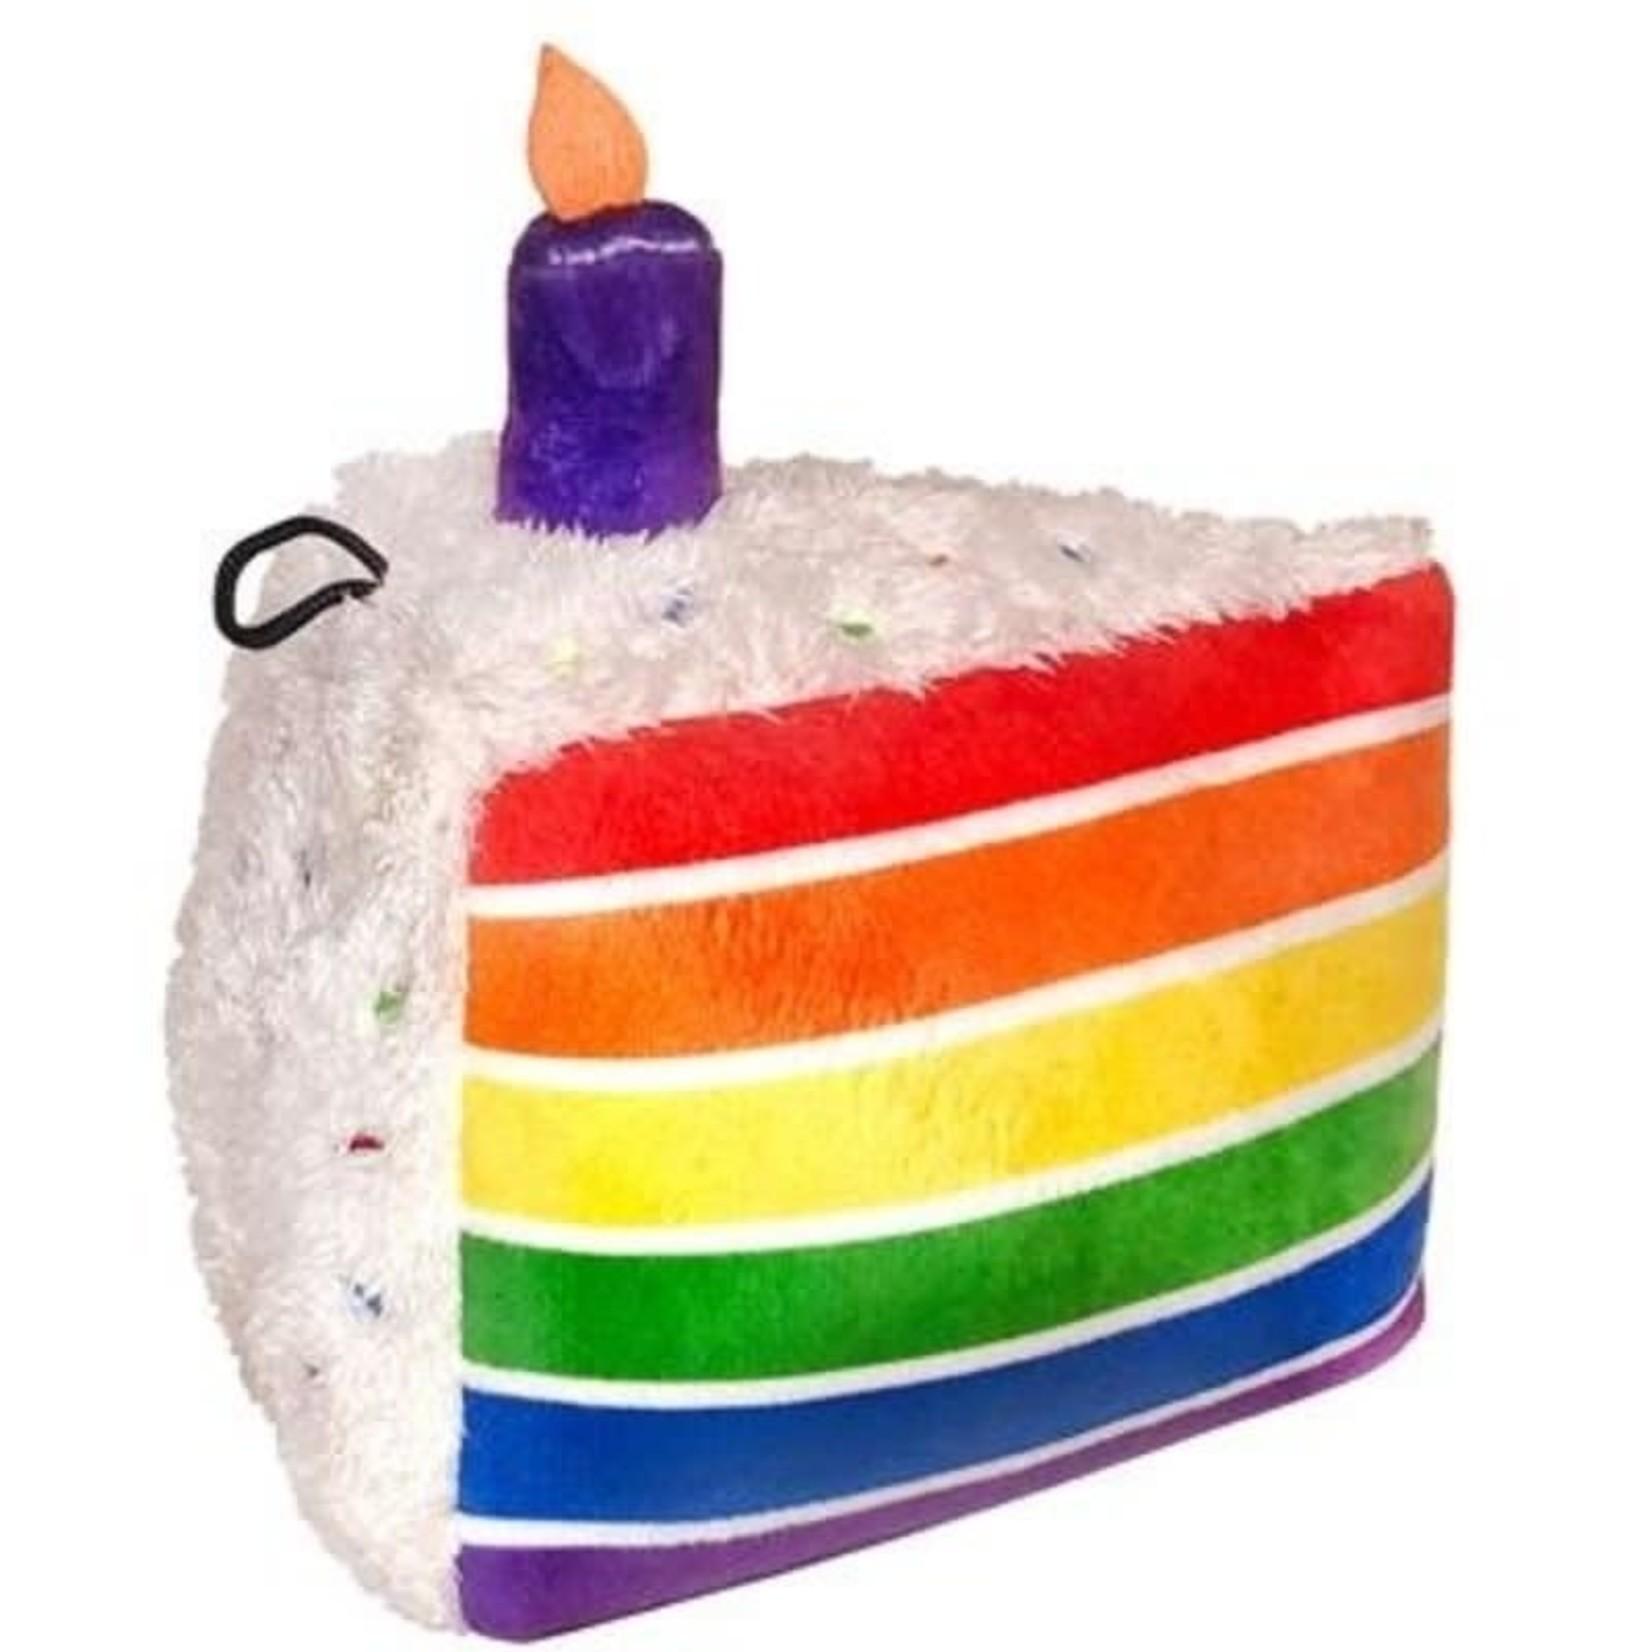 Huxley & Kent Lullabelles Power Plush Funfetti Cake Large